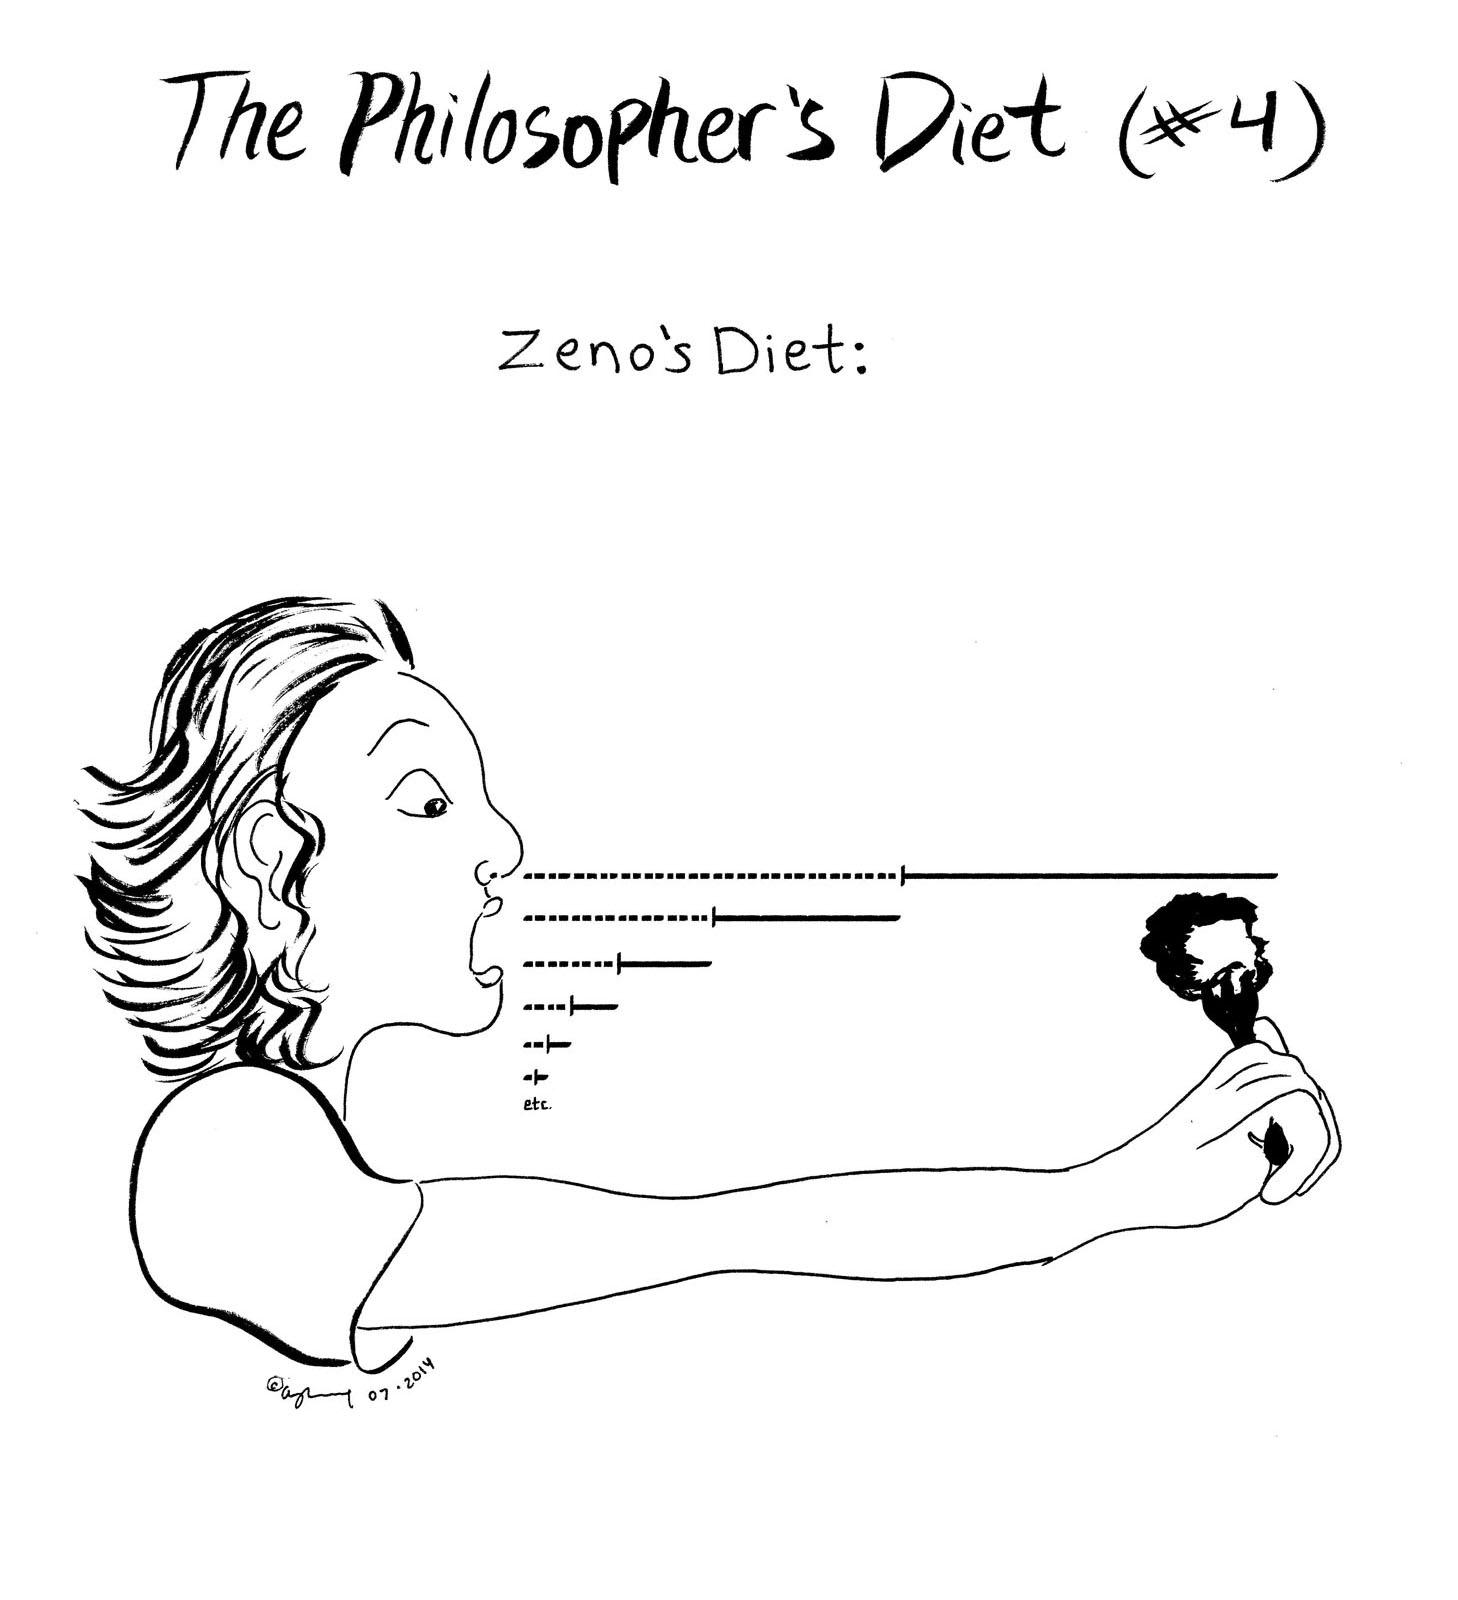 Zeno's diet